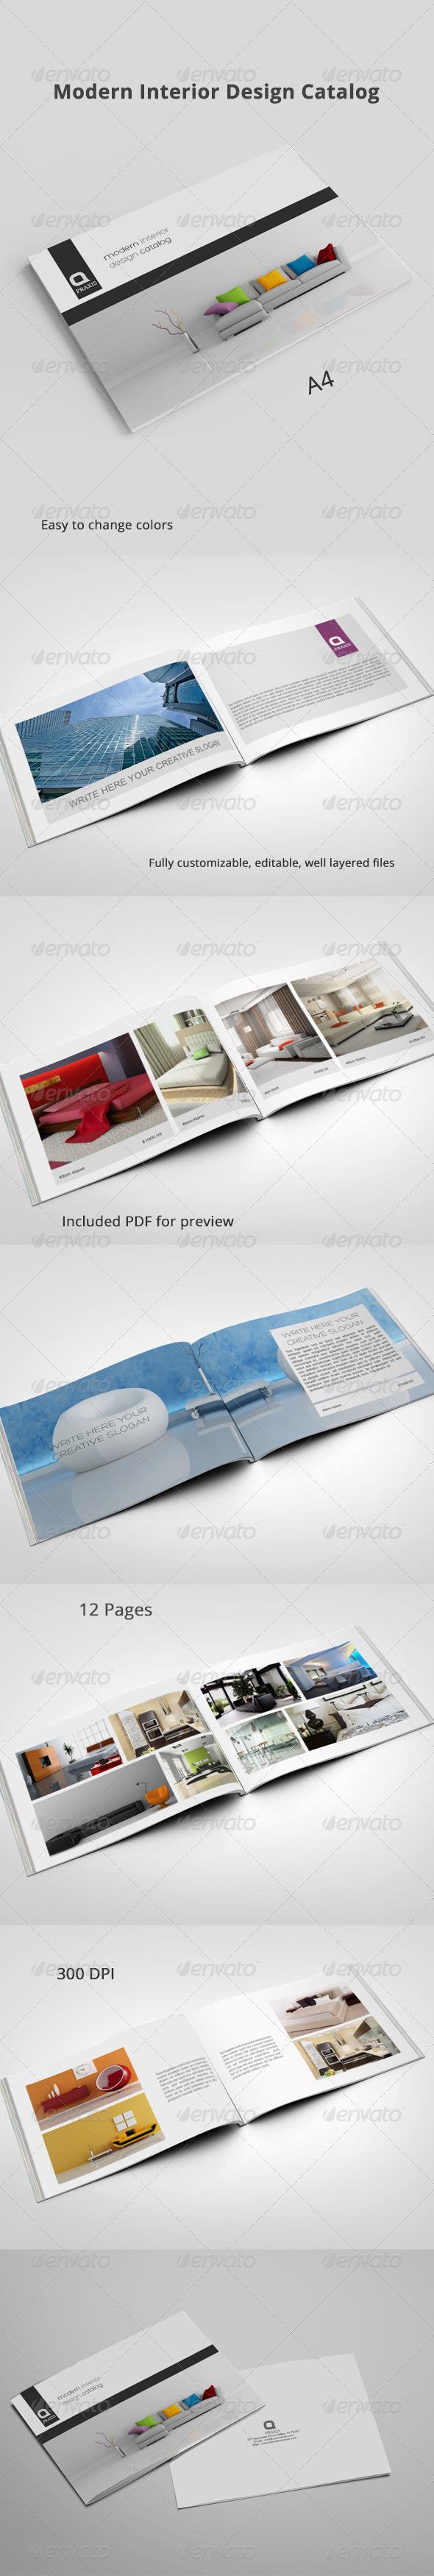 GraphicRiver Modern Interior Design Catalog 8405766